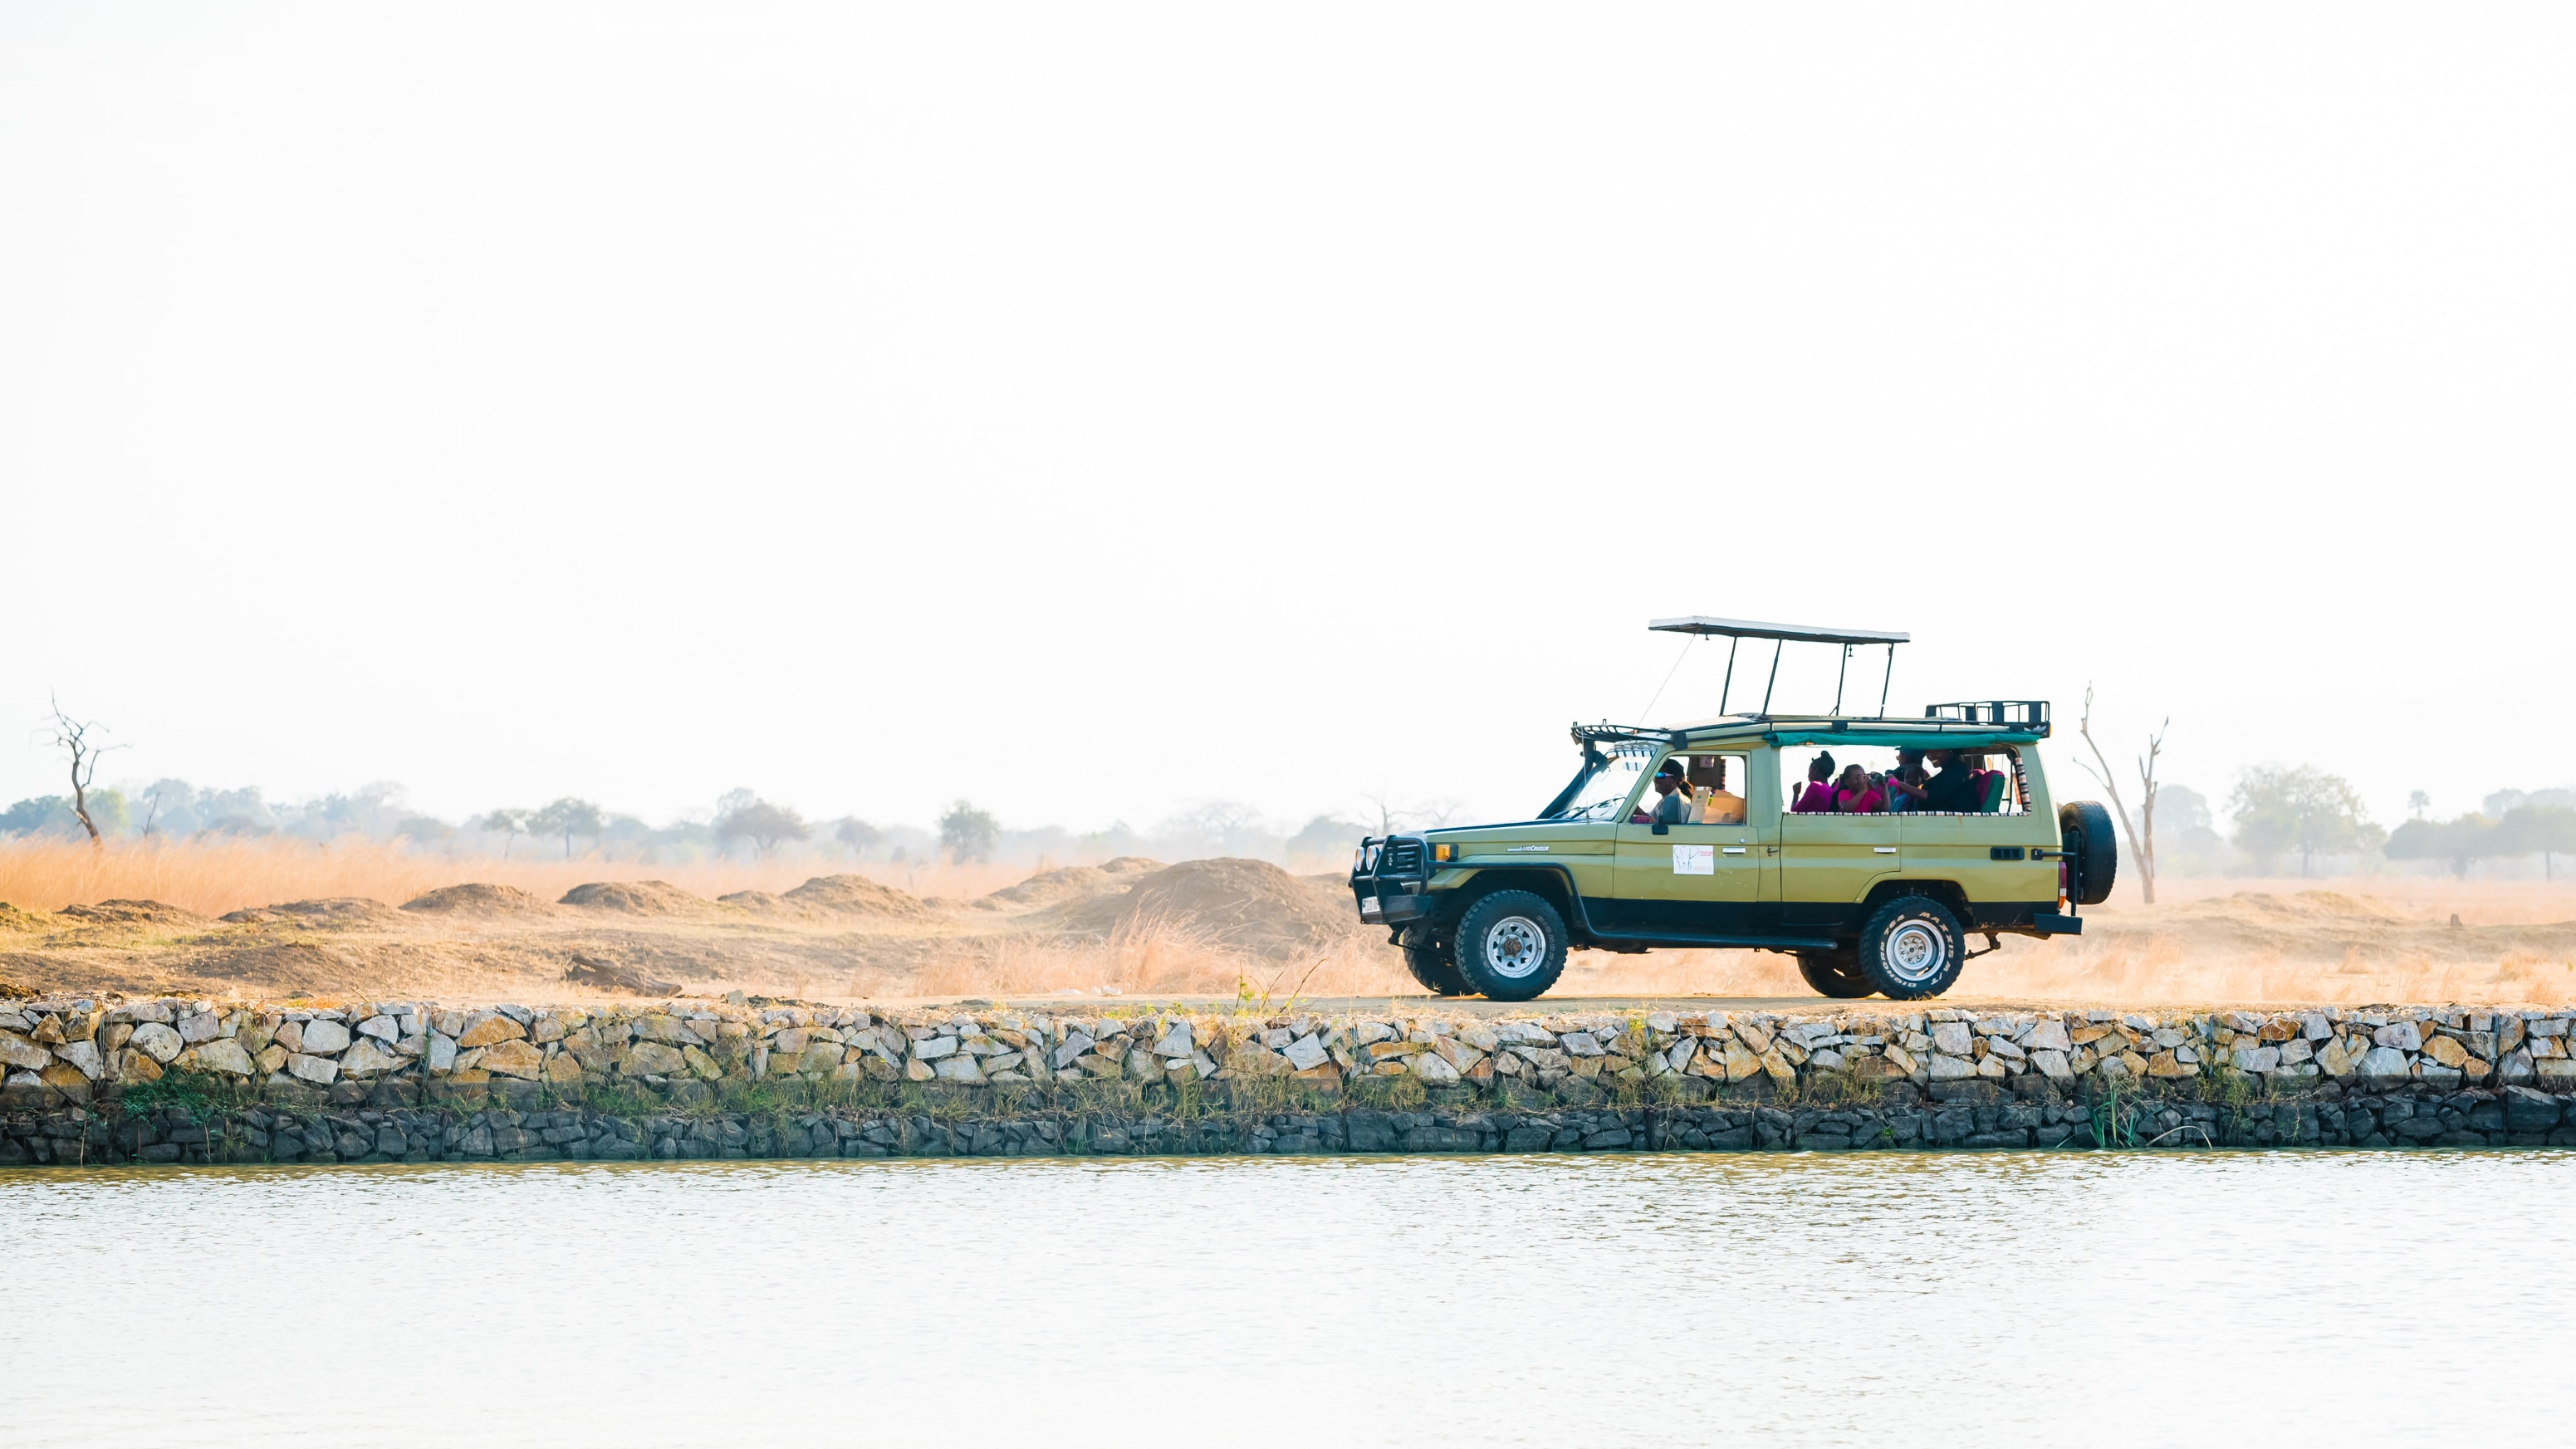 gray SUV near body of water under clear sky